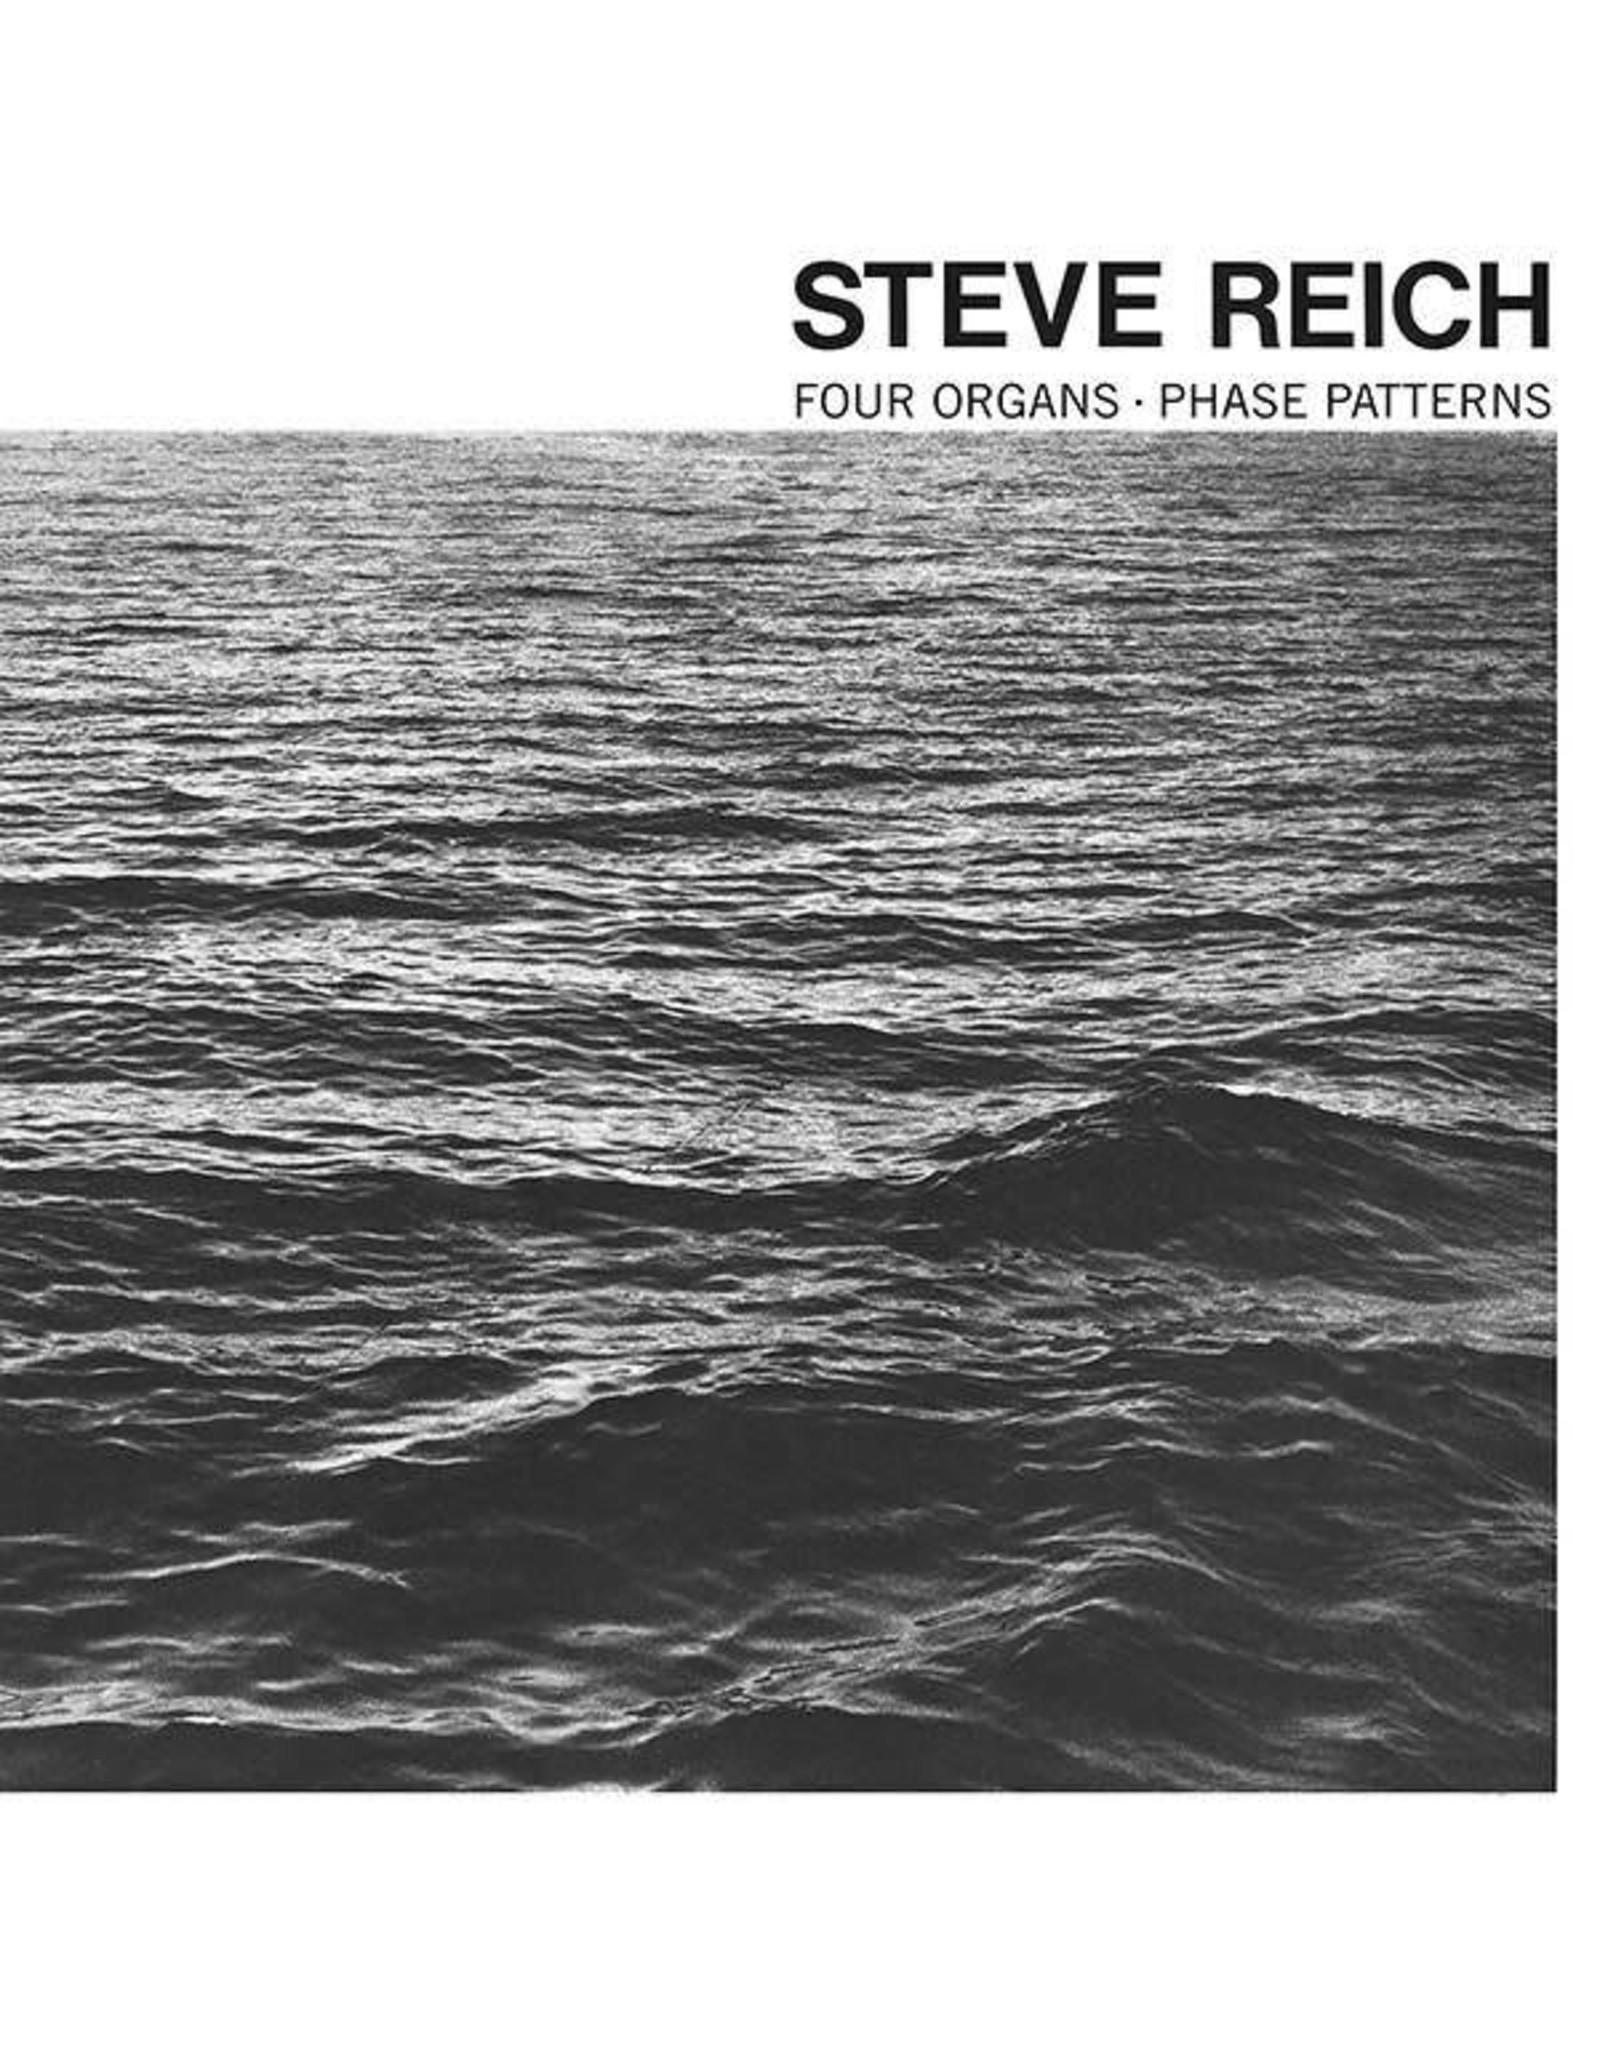 Superior Viaduct Reich, Steve: Four Organs / Phase LP